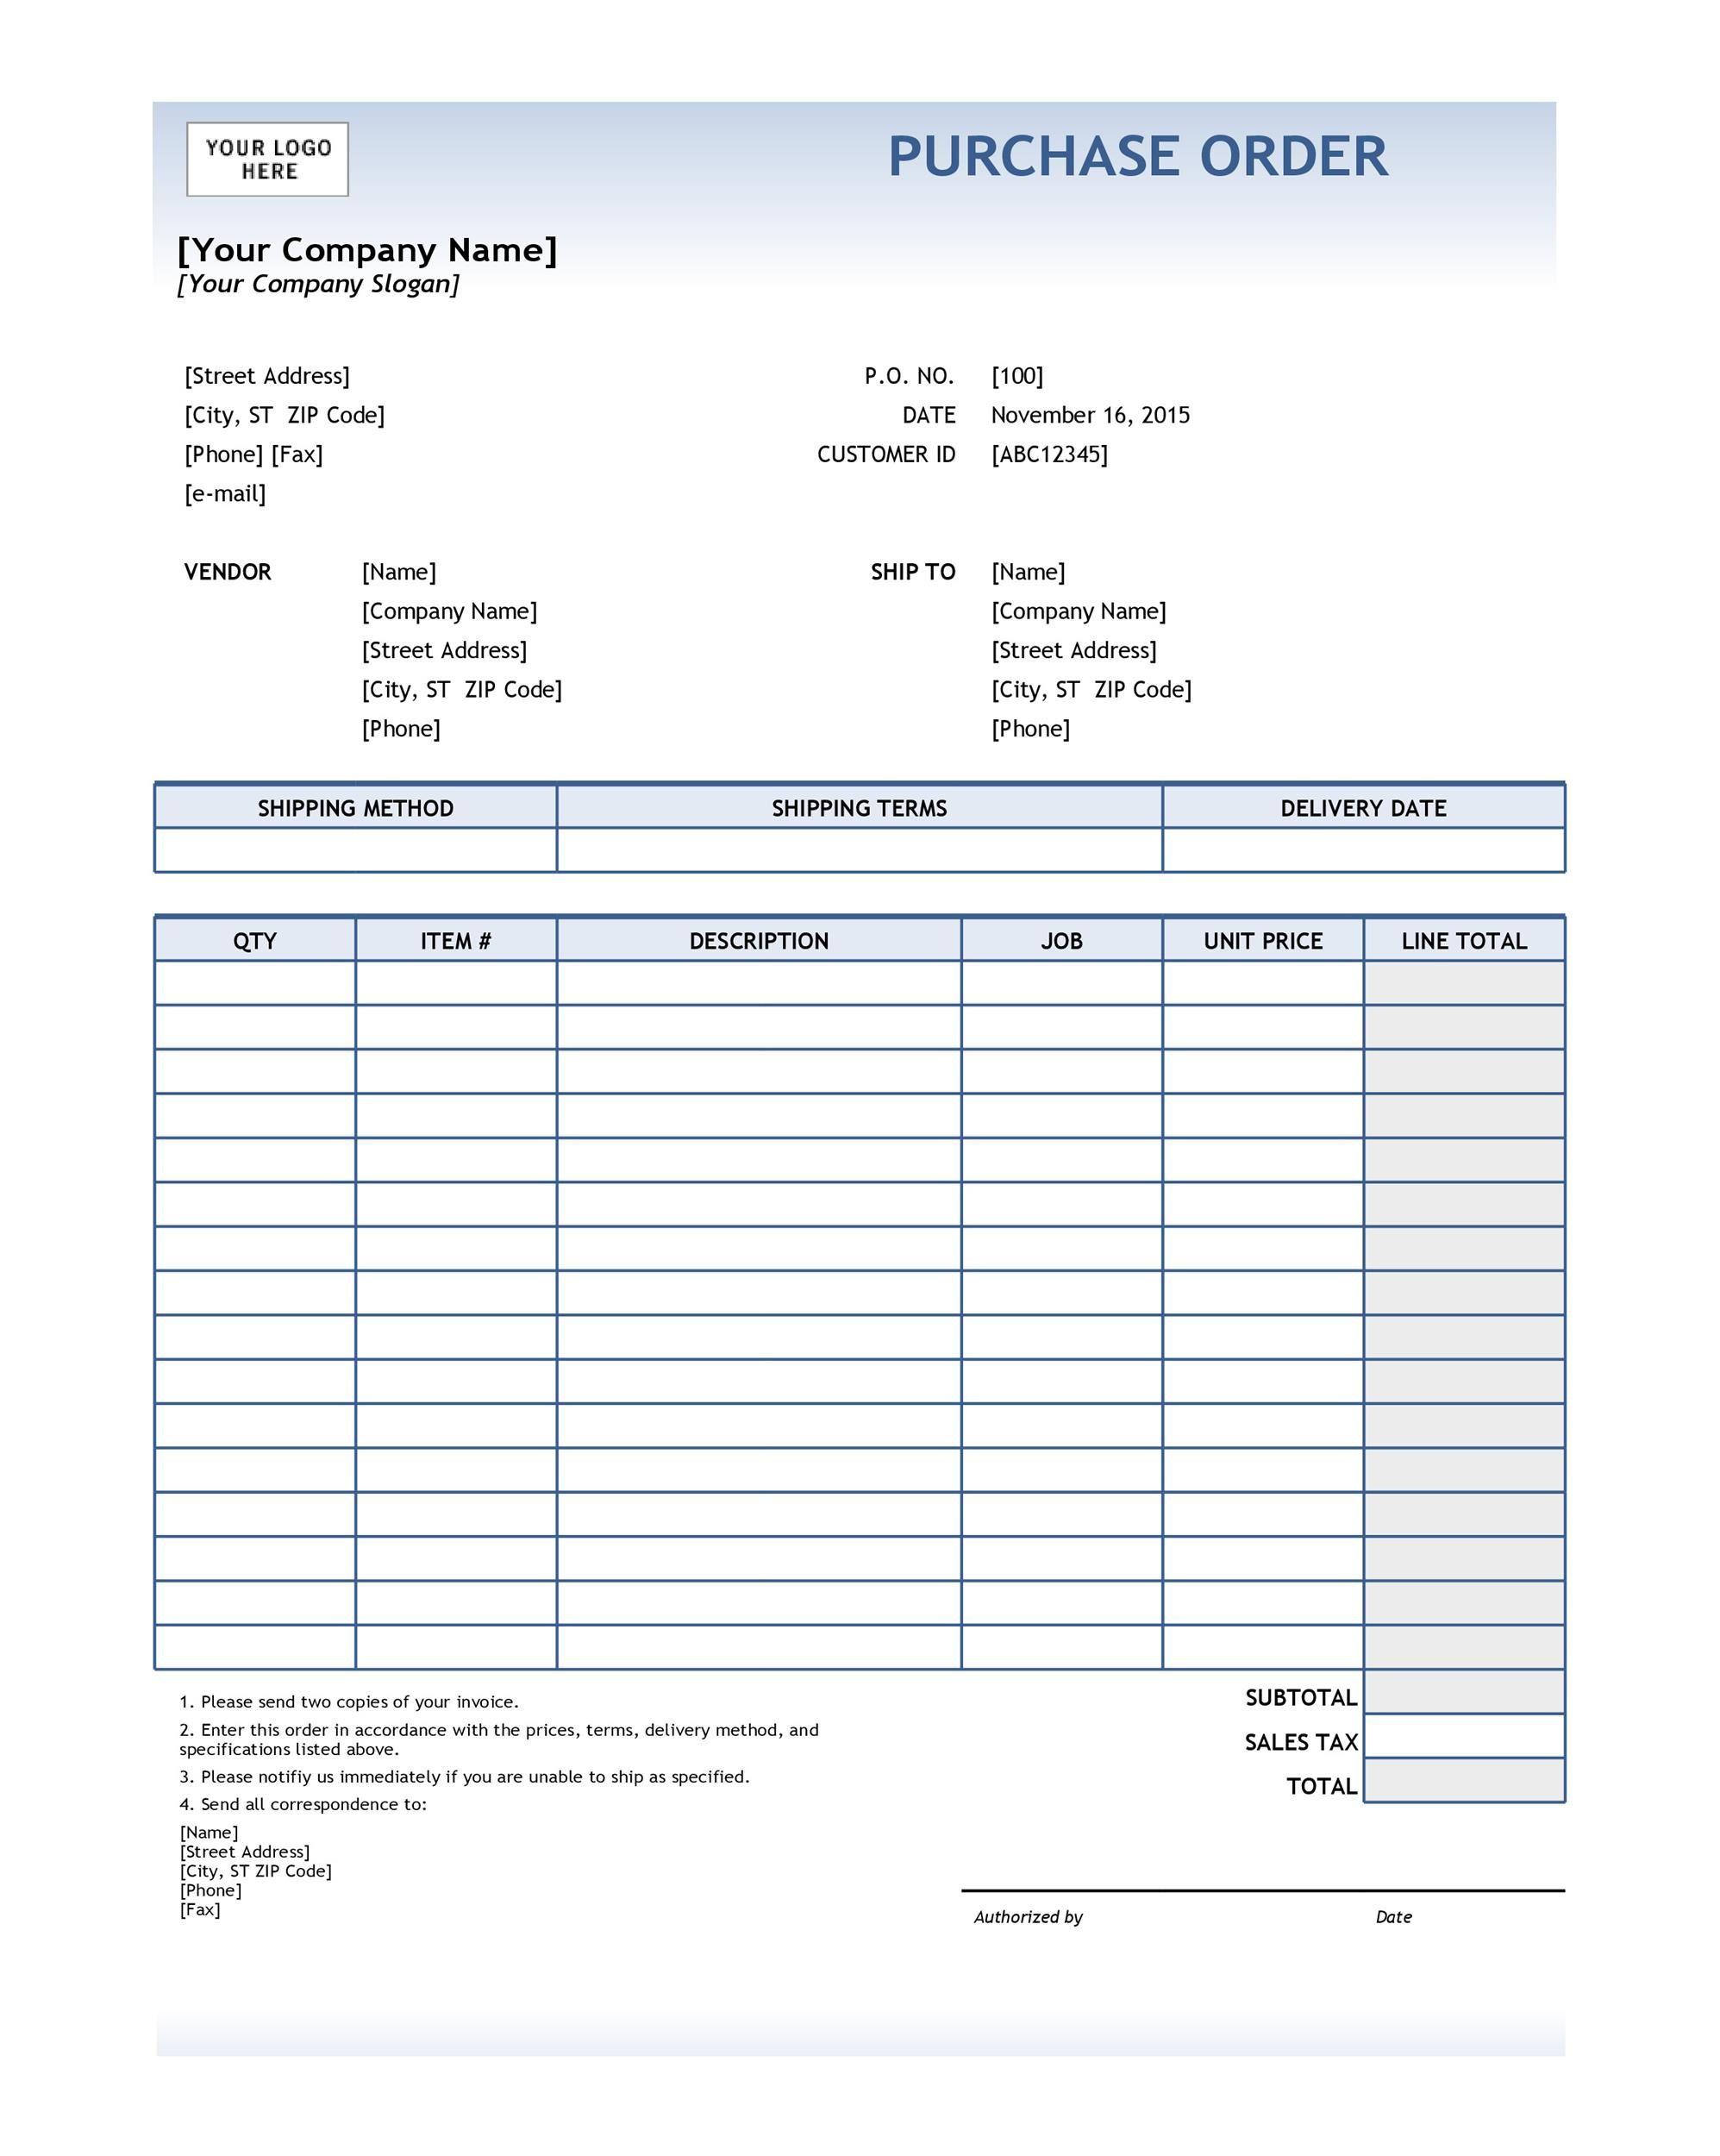 008 Beautiful Purchase Order Template Free Idea  Log M Acces BlanketFull